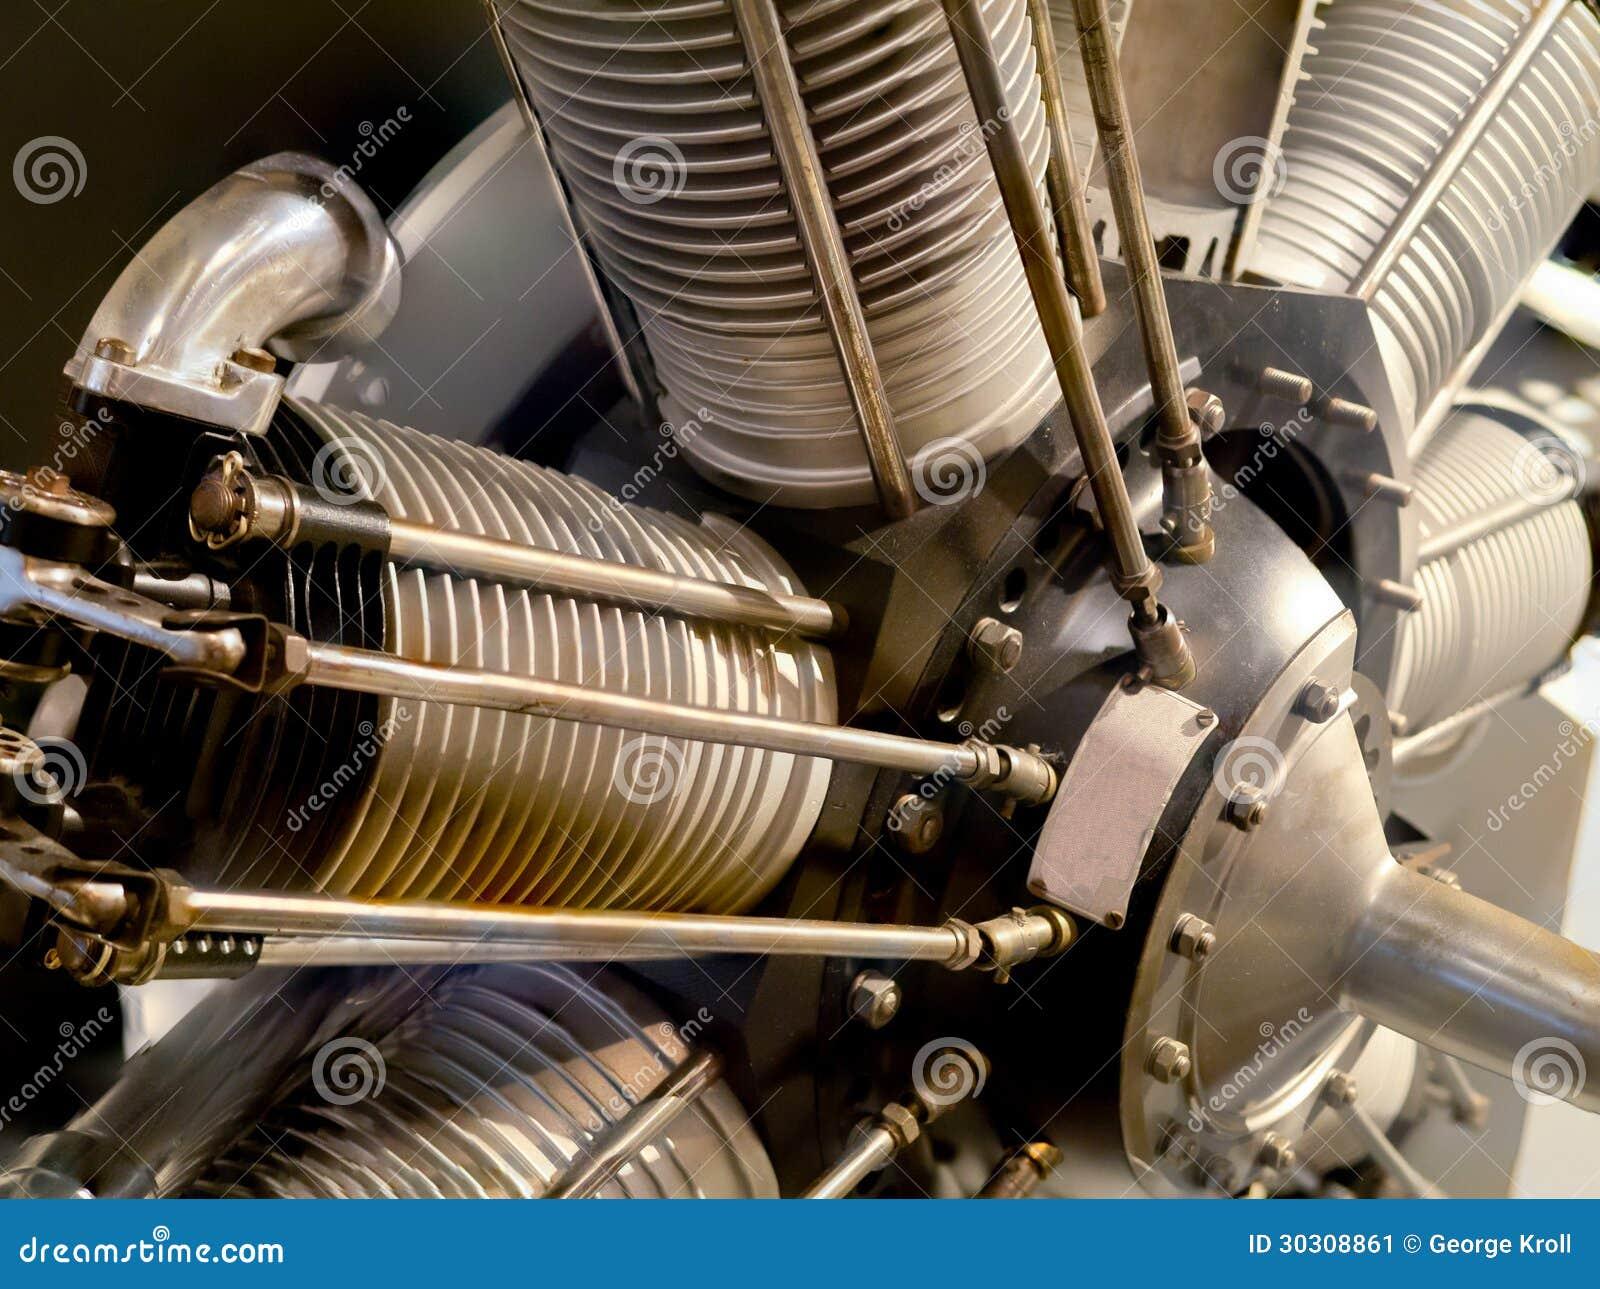 Vintage Radial Airplane Engine Stock Image - Image: 30308861